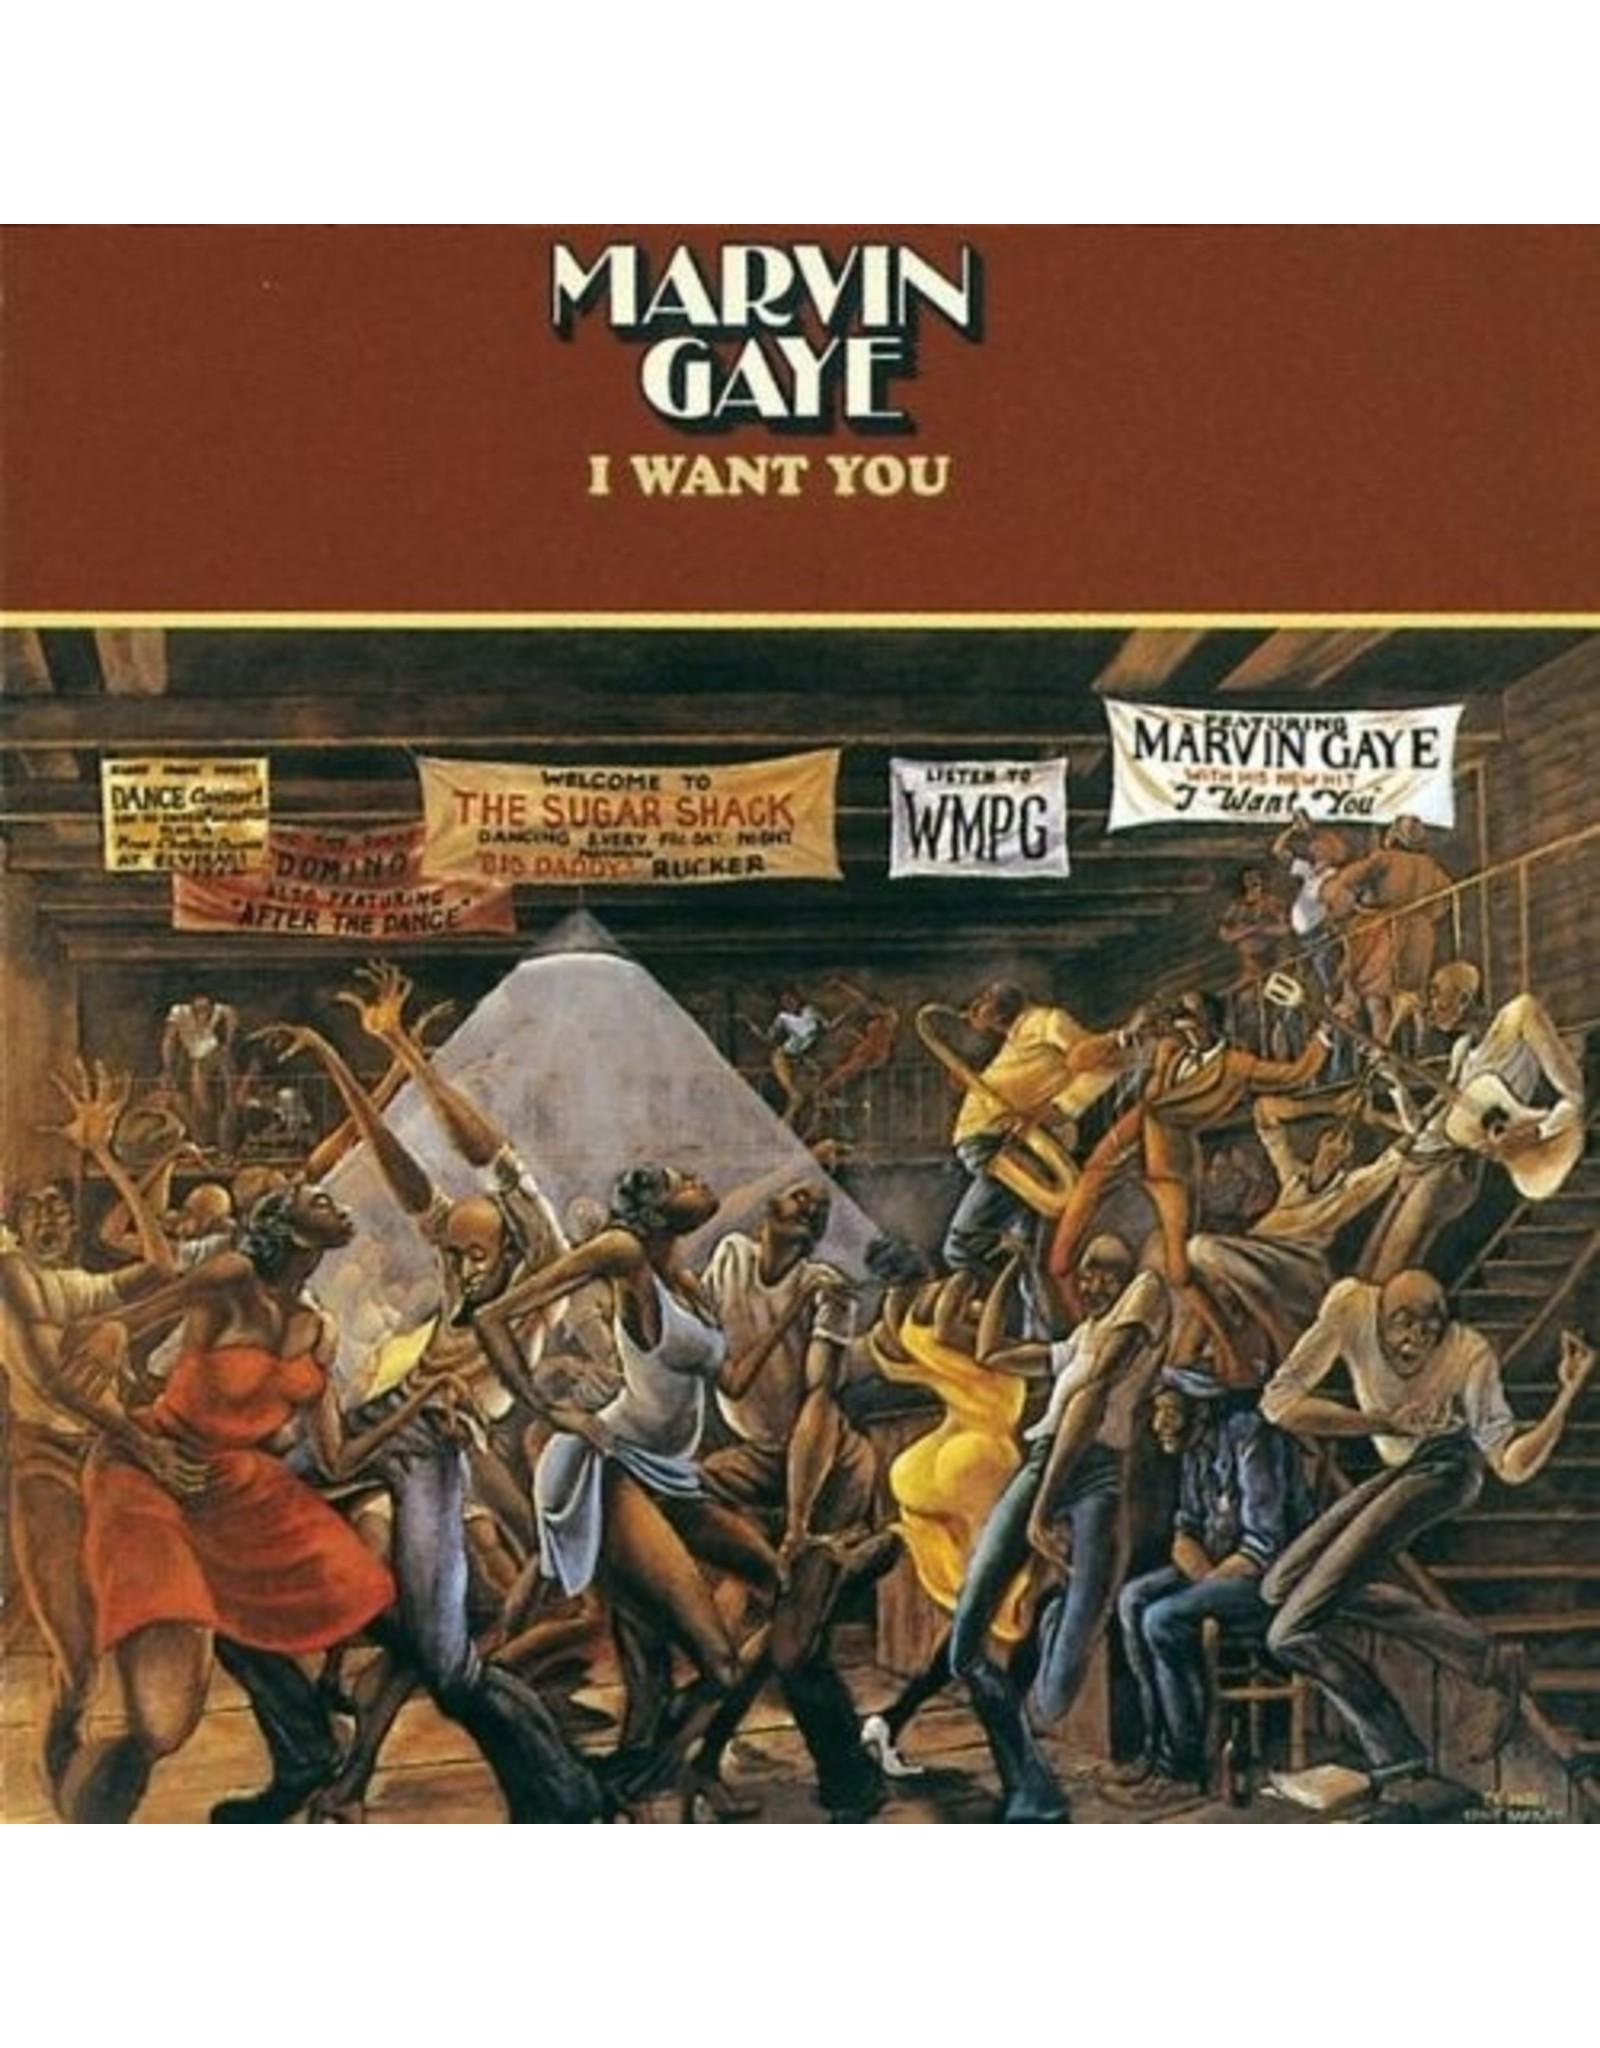 New Vinyl Marvin Gaye - I Want You LP